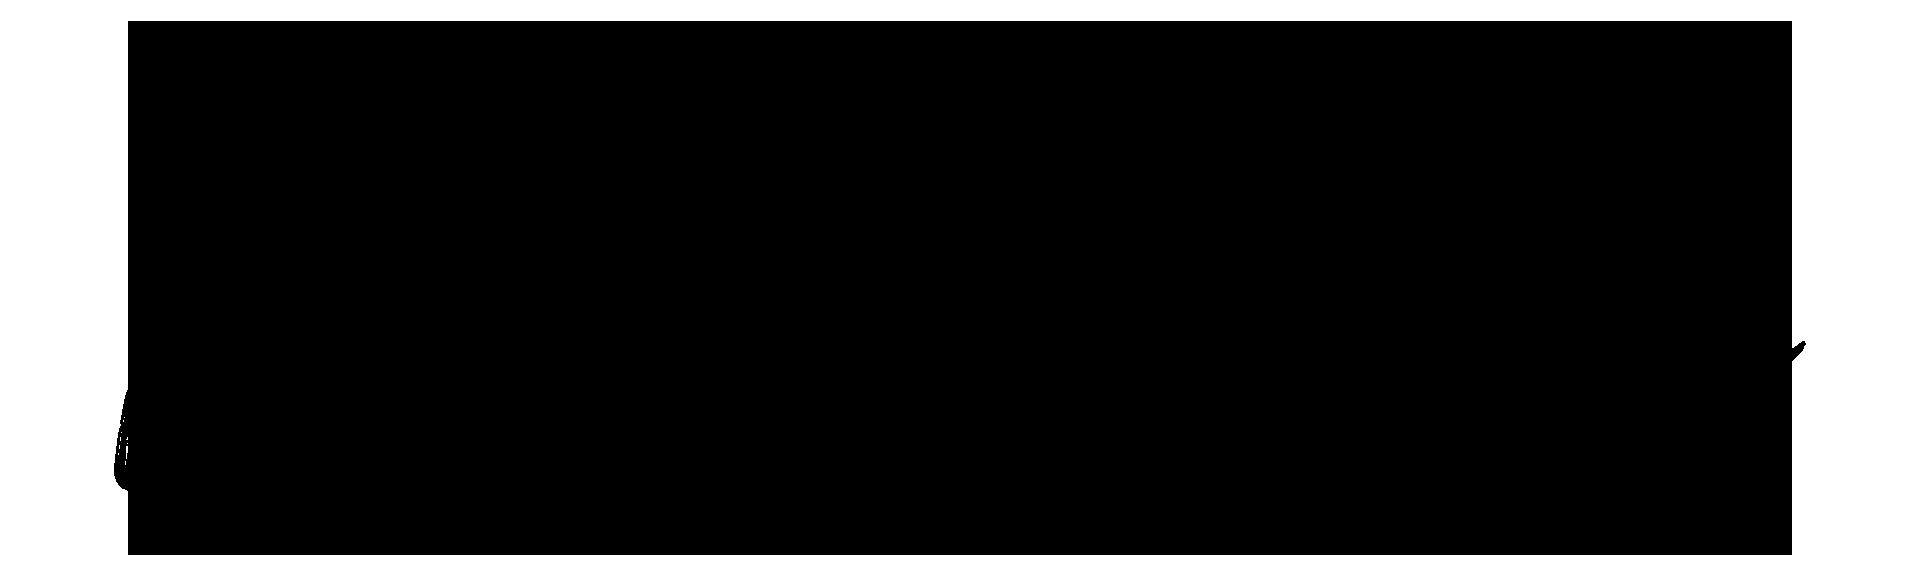 nazia_khatun_logo_black